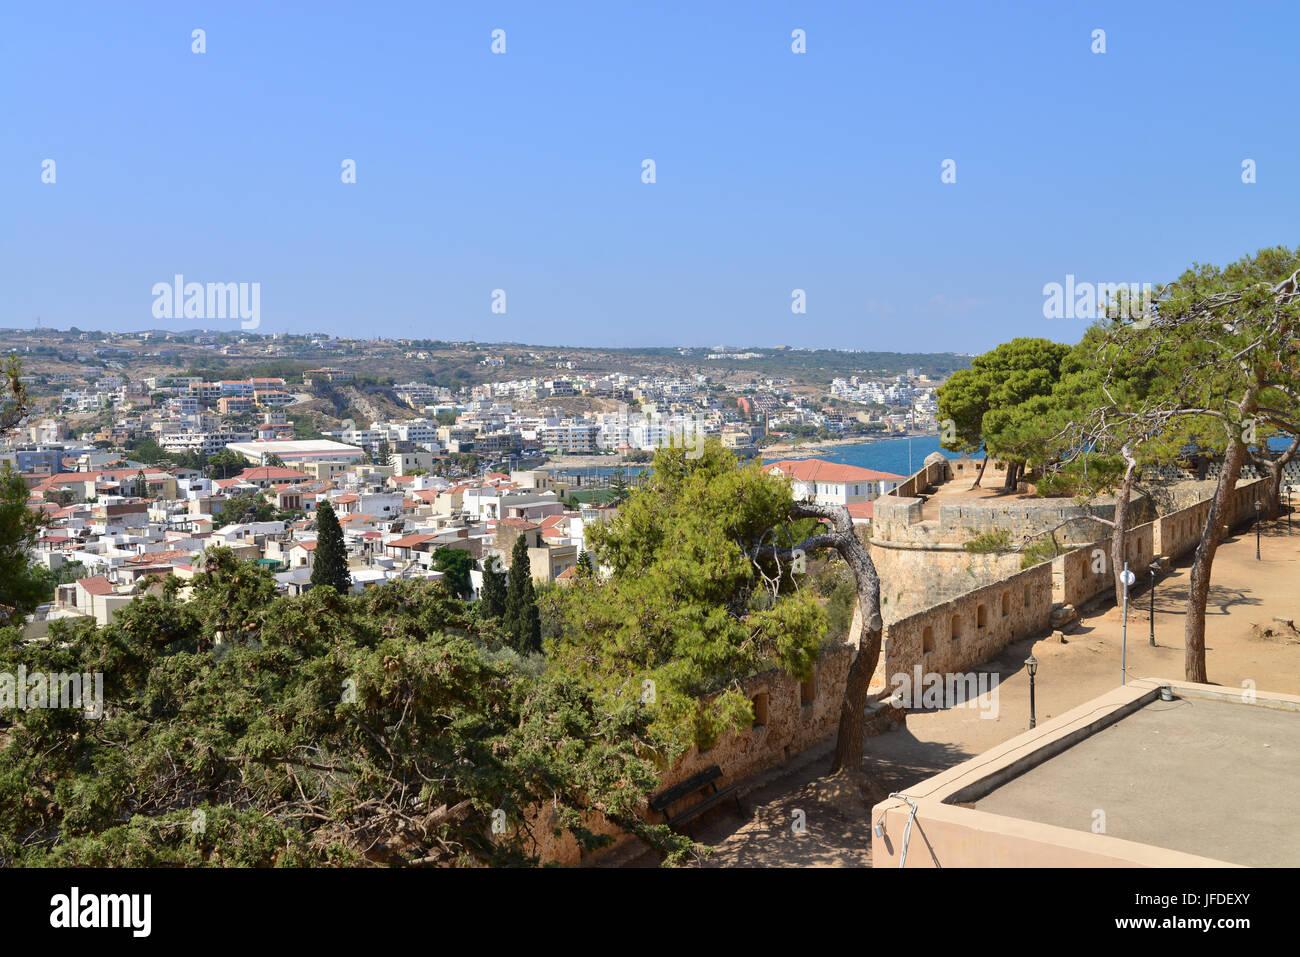 Rethymno Fortezza fortress city view Stock Photo